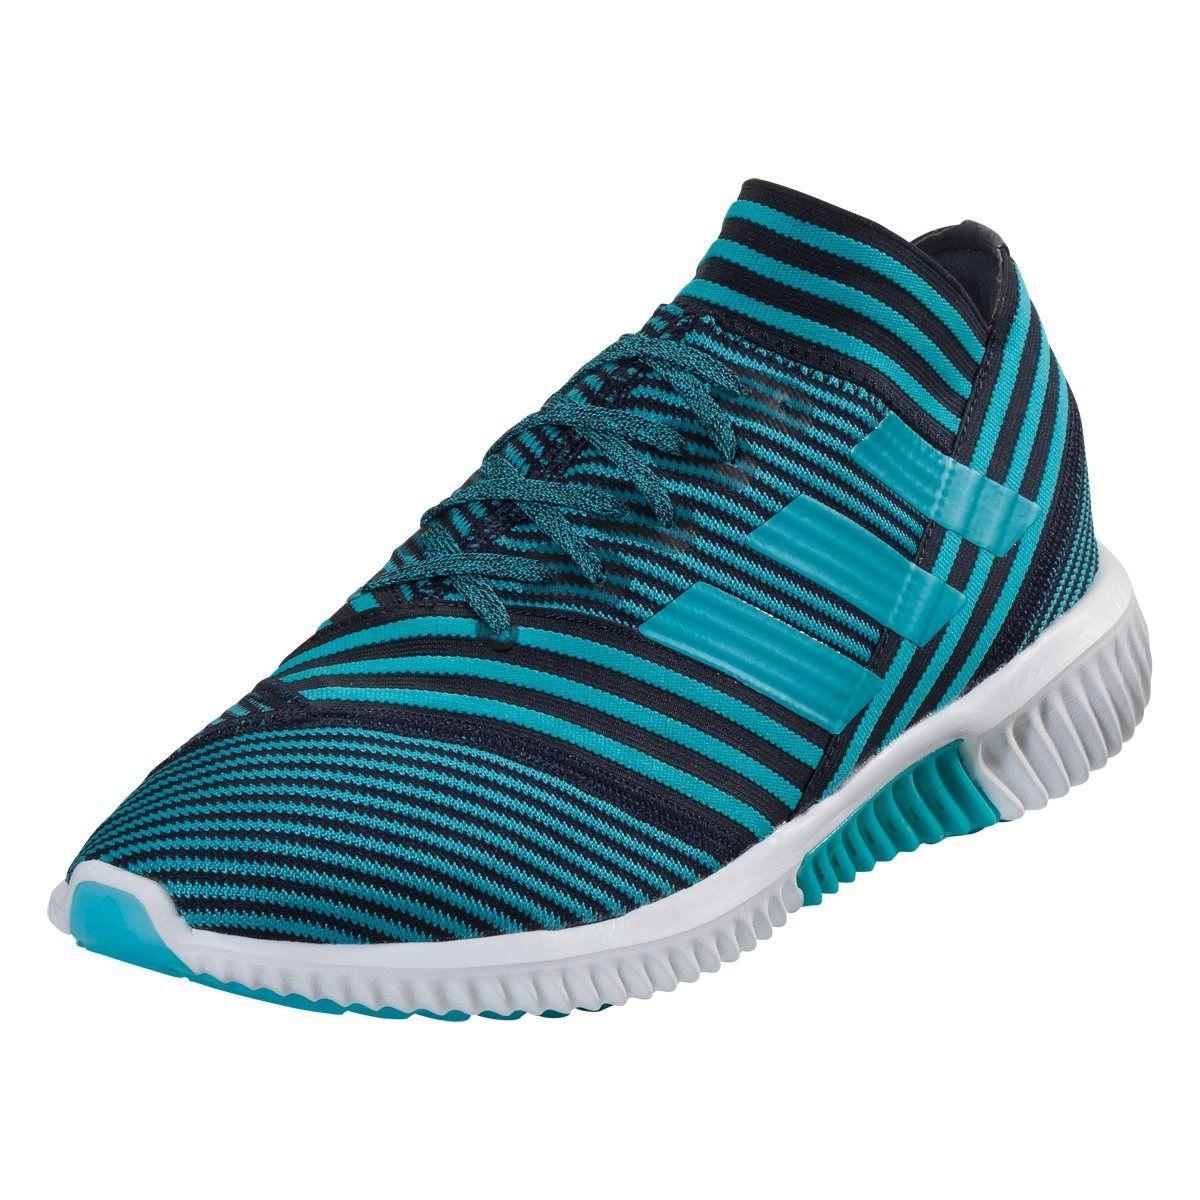 e4c22c353e60 adidas Nemeziz Tango 17.1 TR Soccer Shoe